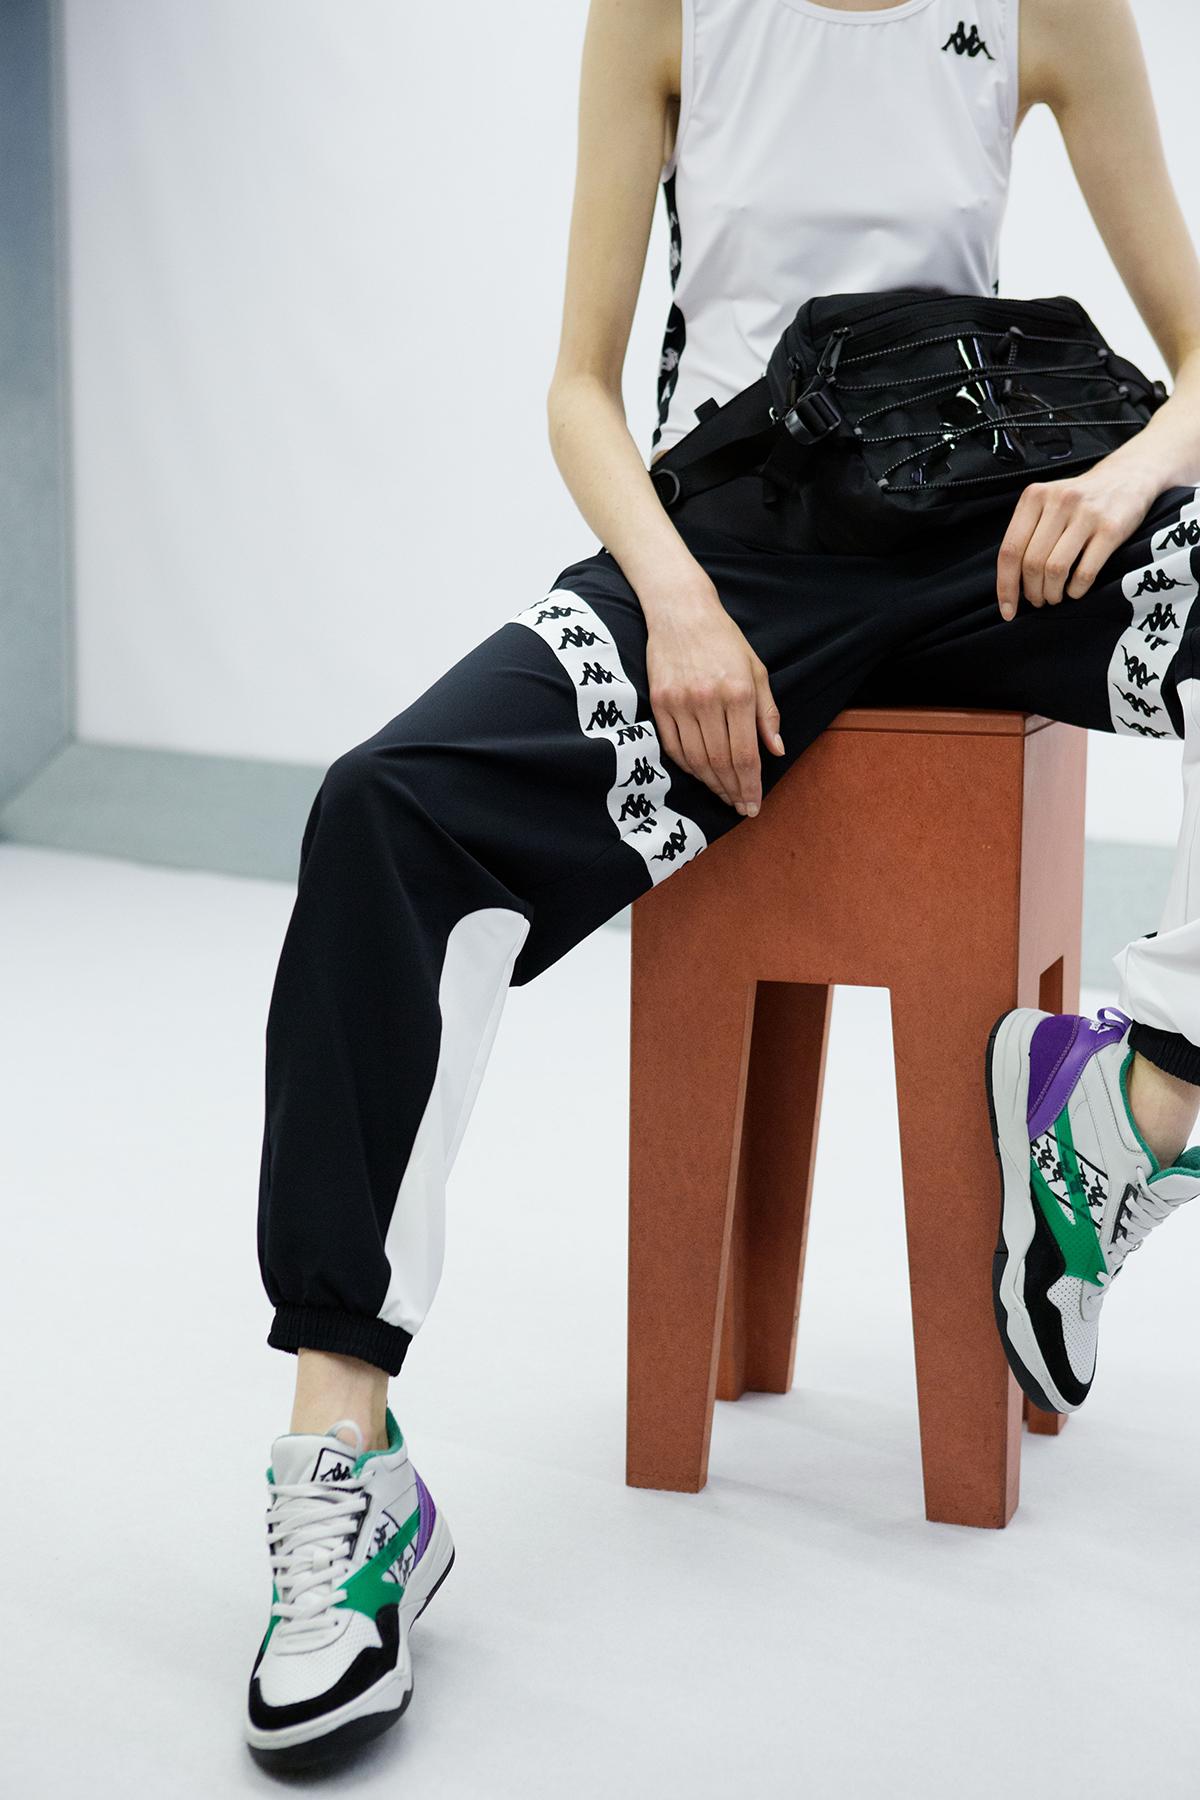 14_kappa_runway_editorial_fashion_federica_borgato